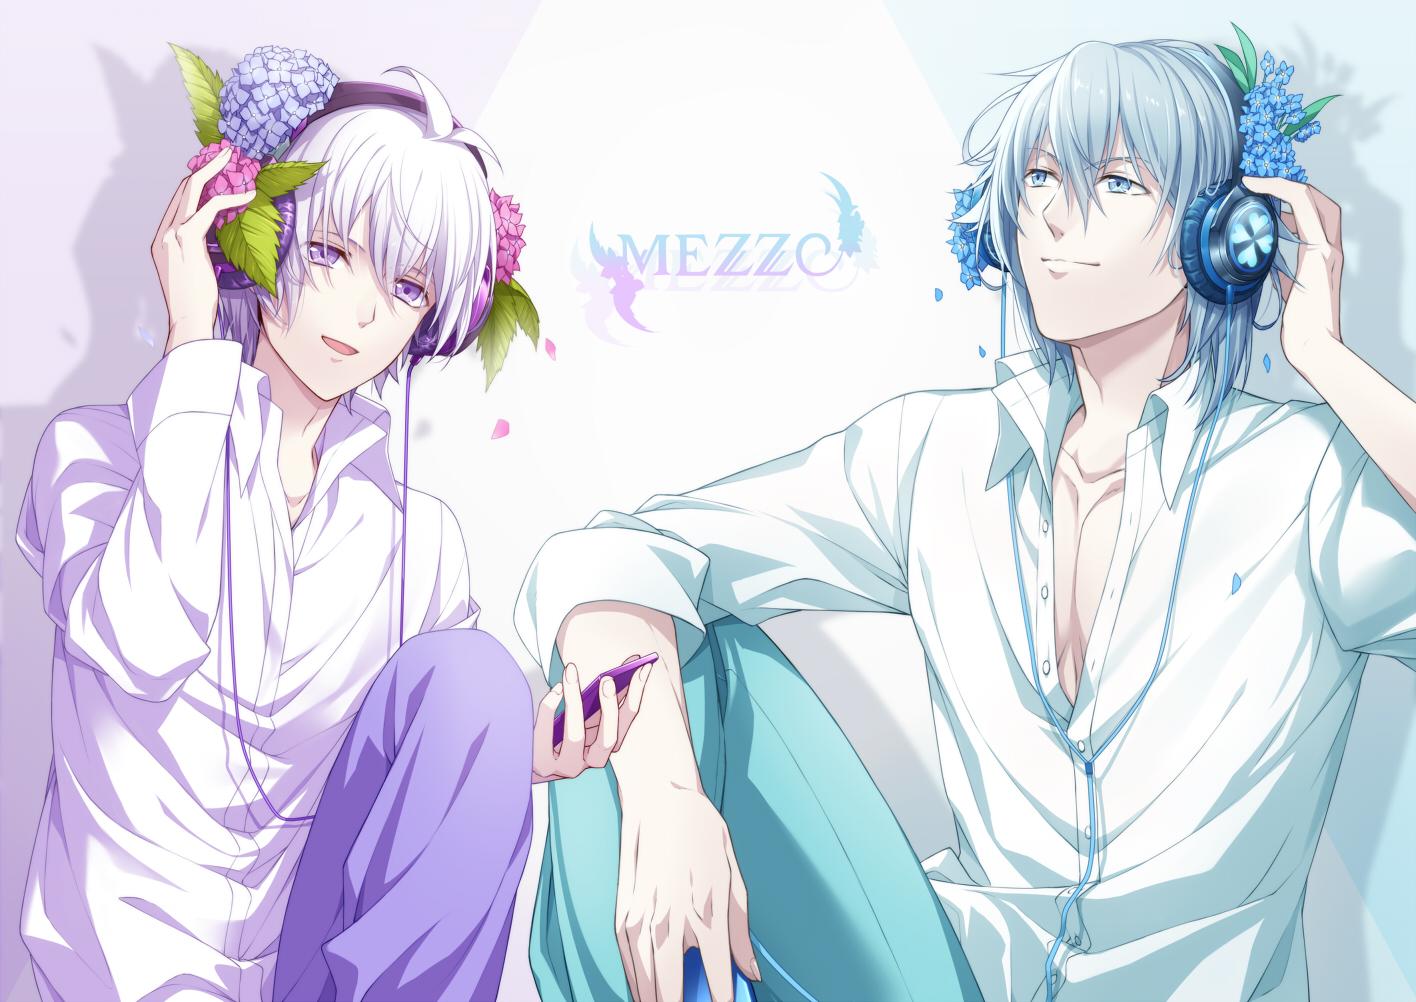 all_male aqua_eyes gray_hair headphones idolish7 male nnm_kmym petals phone purple_eyes purple_hair short_hair tagme_(character) yotsuba_tamaki